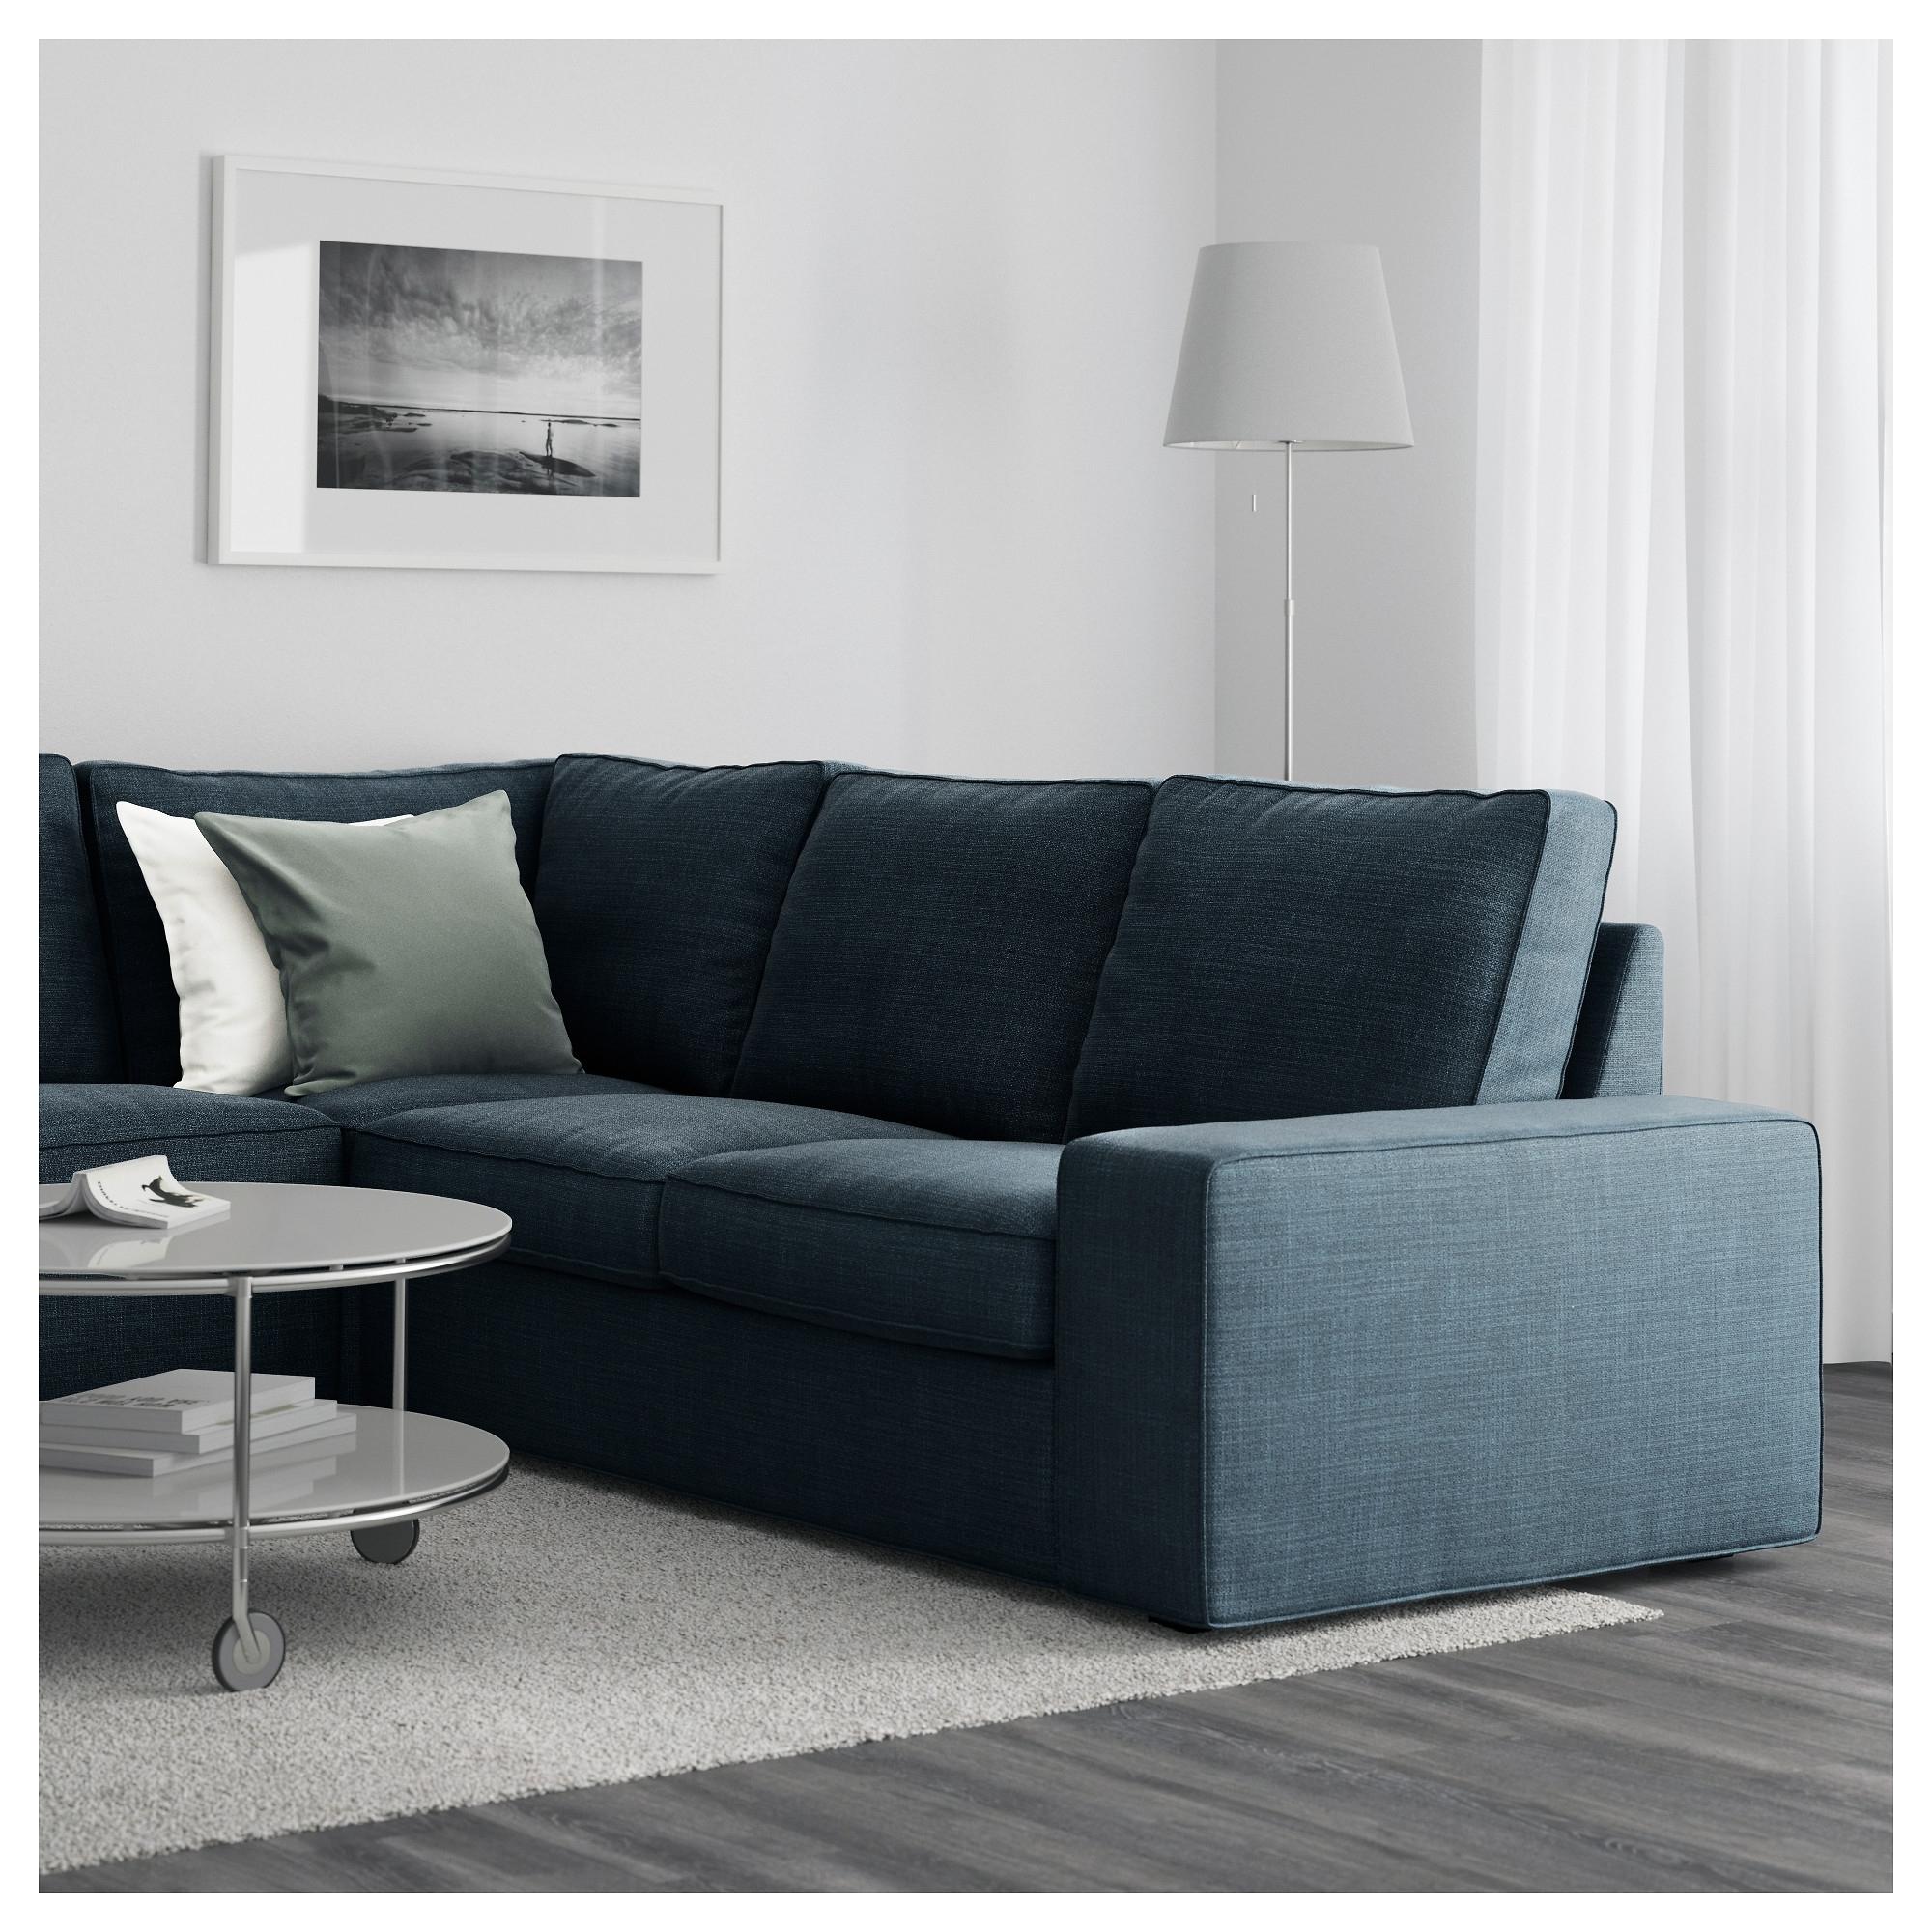 Ikea Kivik Chaises Inside 2017 Kivik Sectional, 5 Seat Corner – Hillared Dark Blue – Ikea (View 6 of 15)